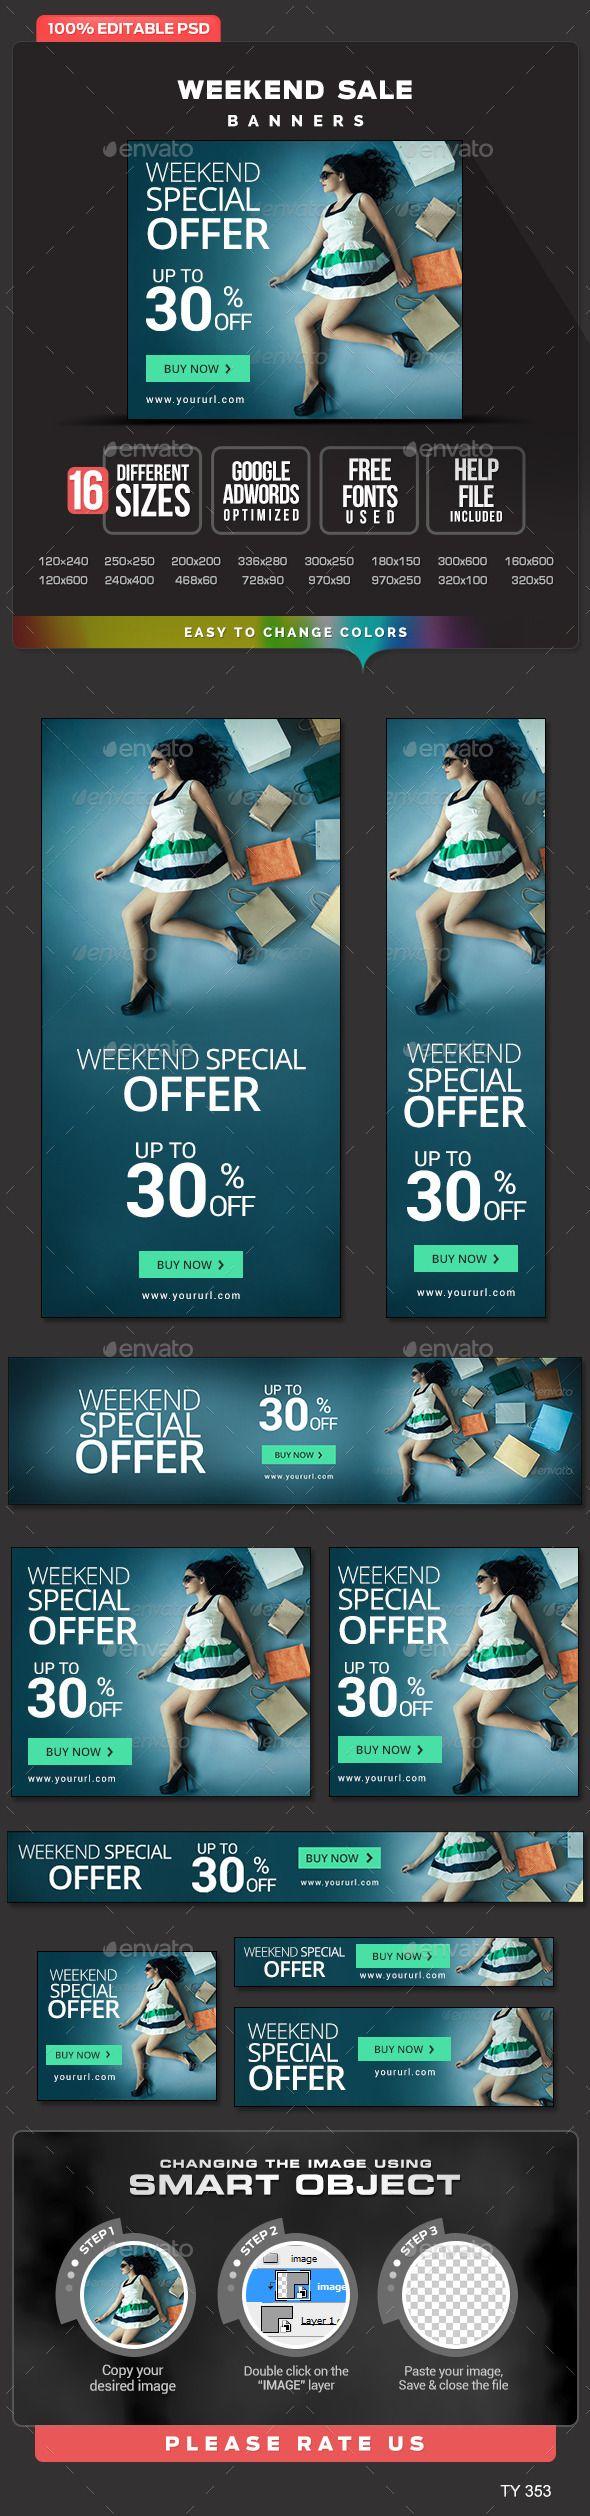 Weekend Sale Banners Template PSD #banner #webbanner #design Download: http://graphicriver.net/item/weekend-sale-banners/10667359?ref=ksioks